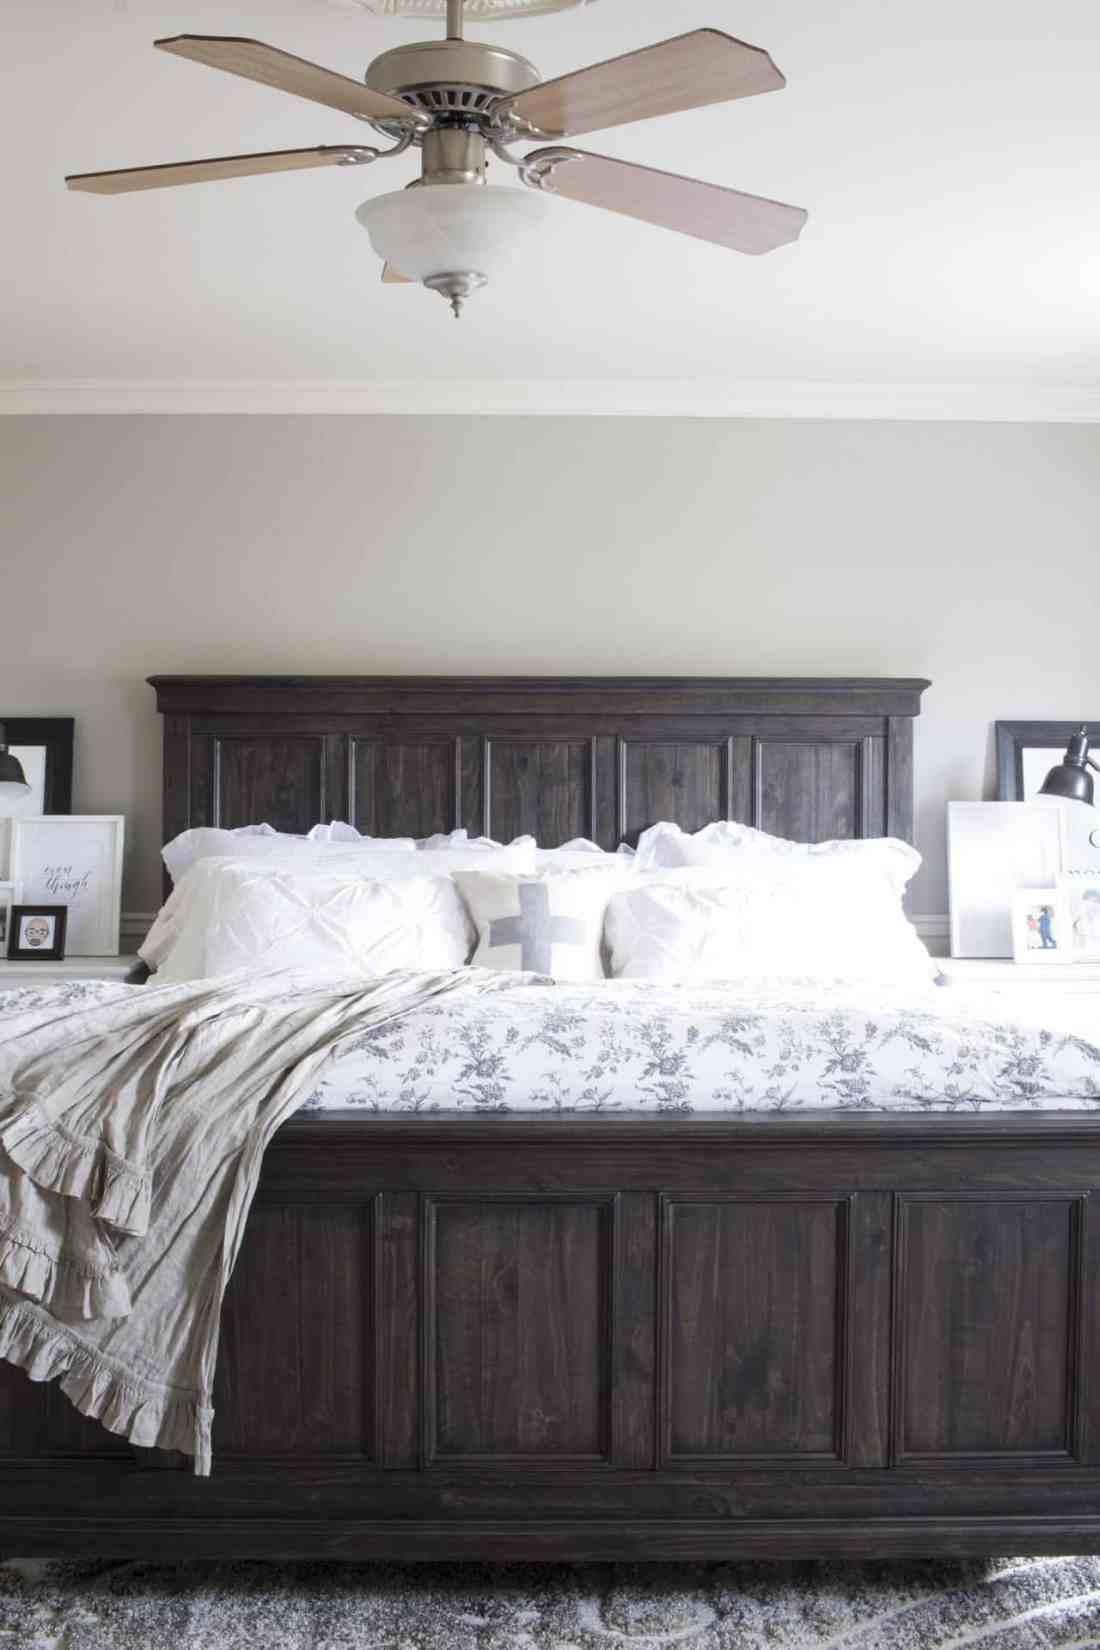 bedroom shot with ceiling fan